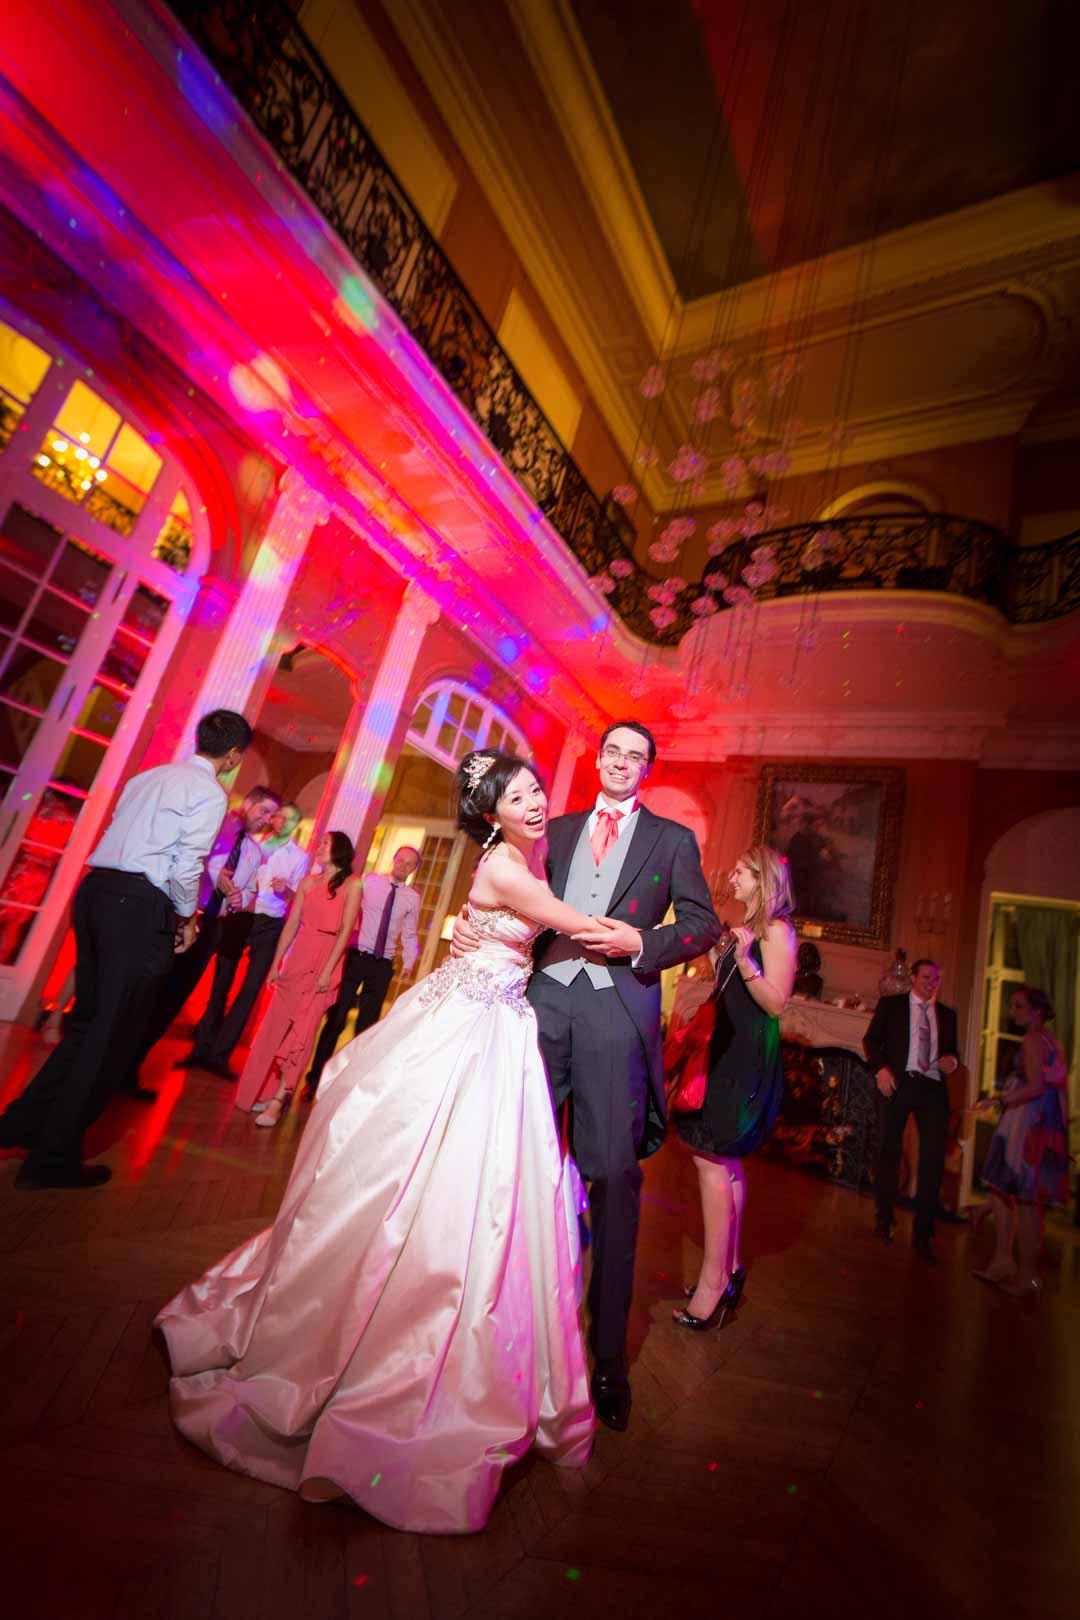 soiree-mariage-maison-arts-et-metiers.jpg